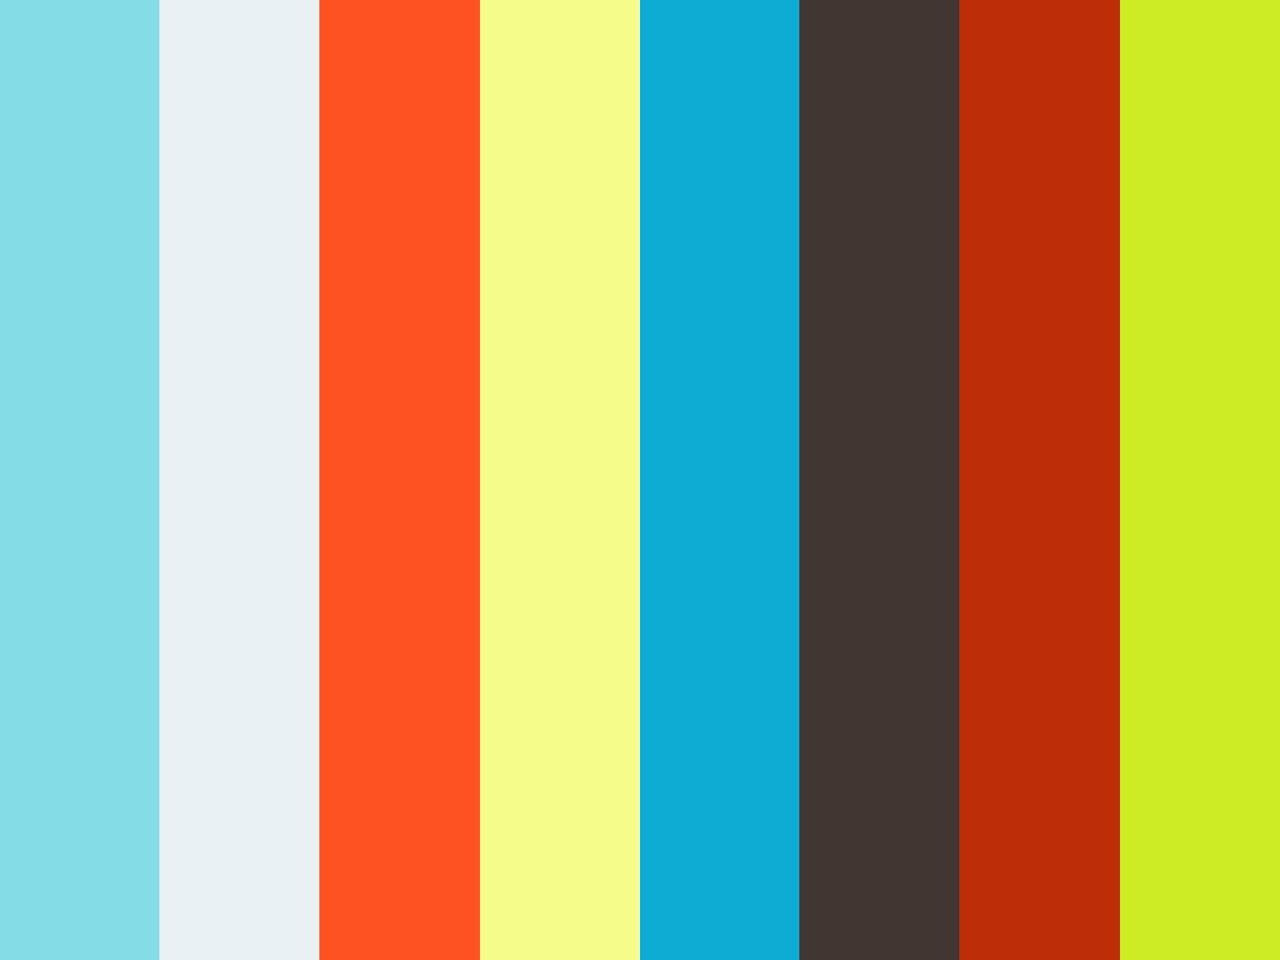 Signature Collaboration: Paul Knox & Tony Tee Neto Rock Clarks Landing, Pt Pleasant #LGBT #DJPaulKnox #TonyTeeNeto #sceKevinBob